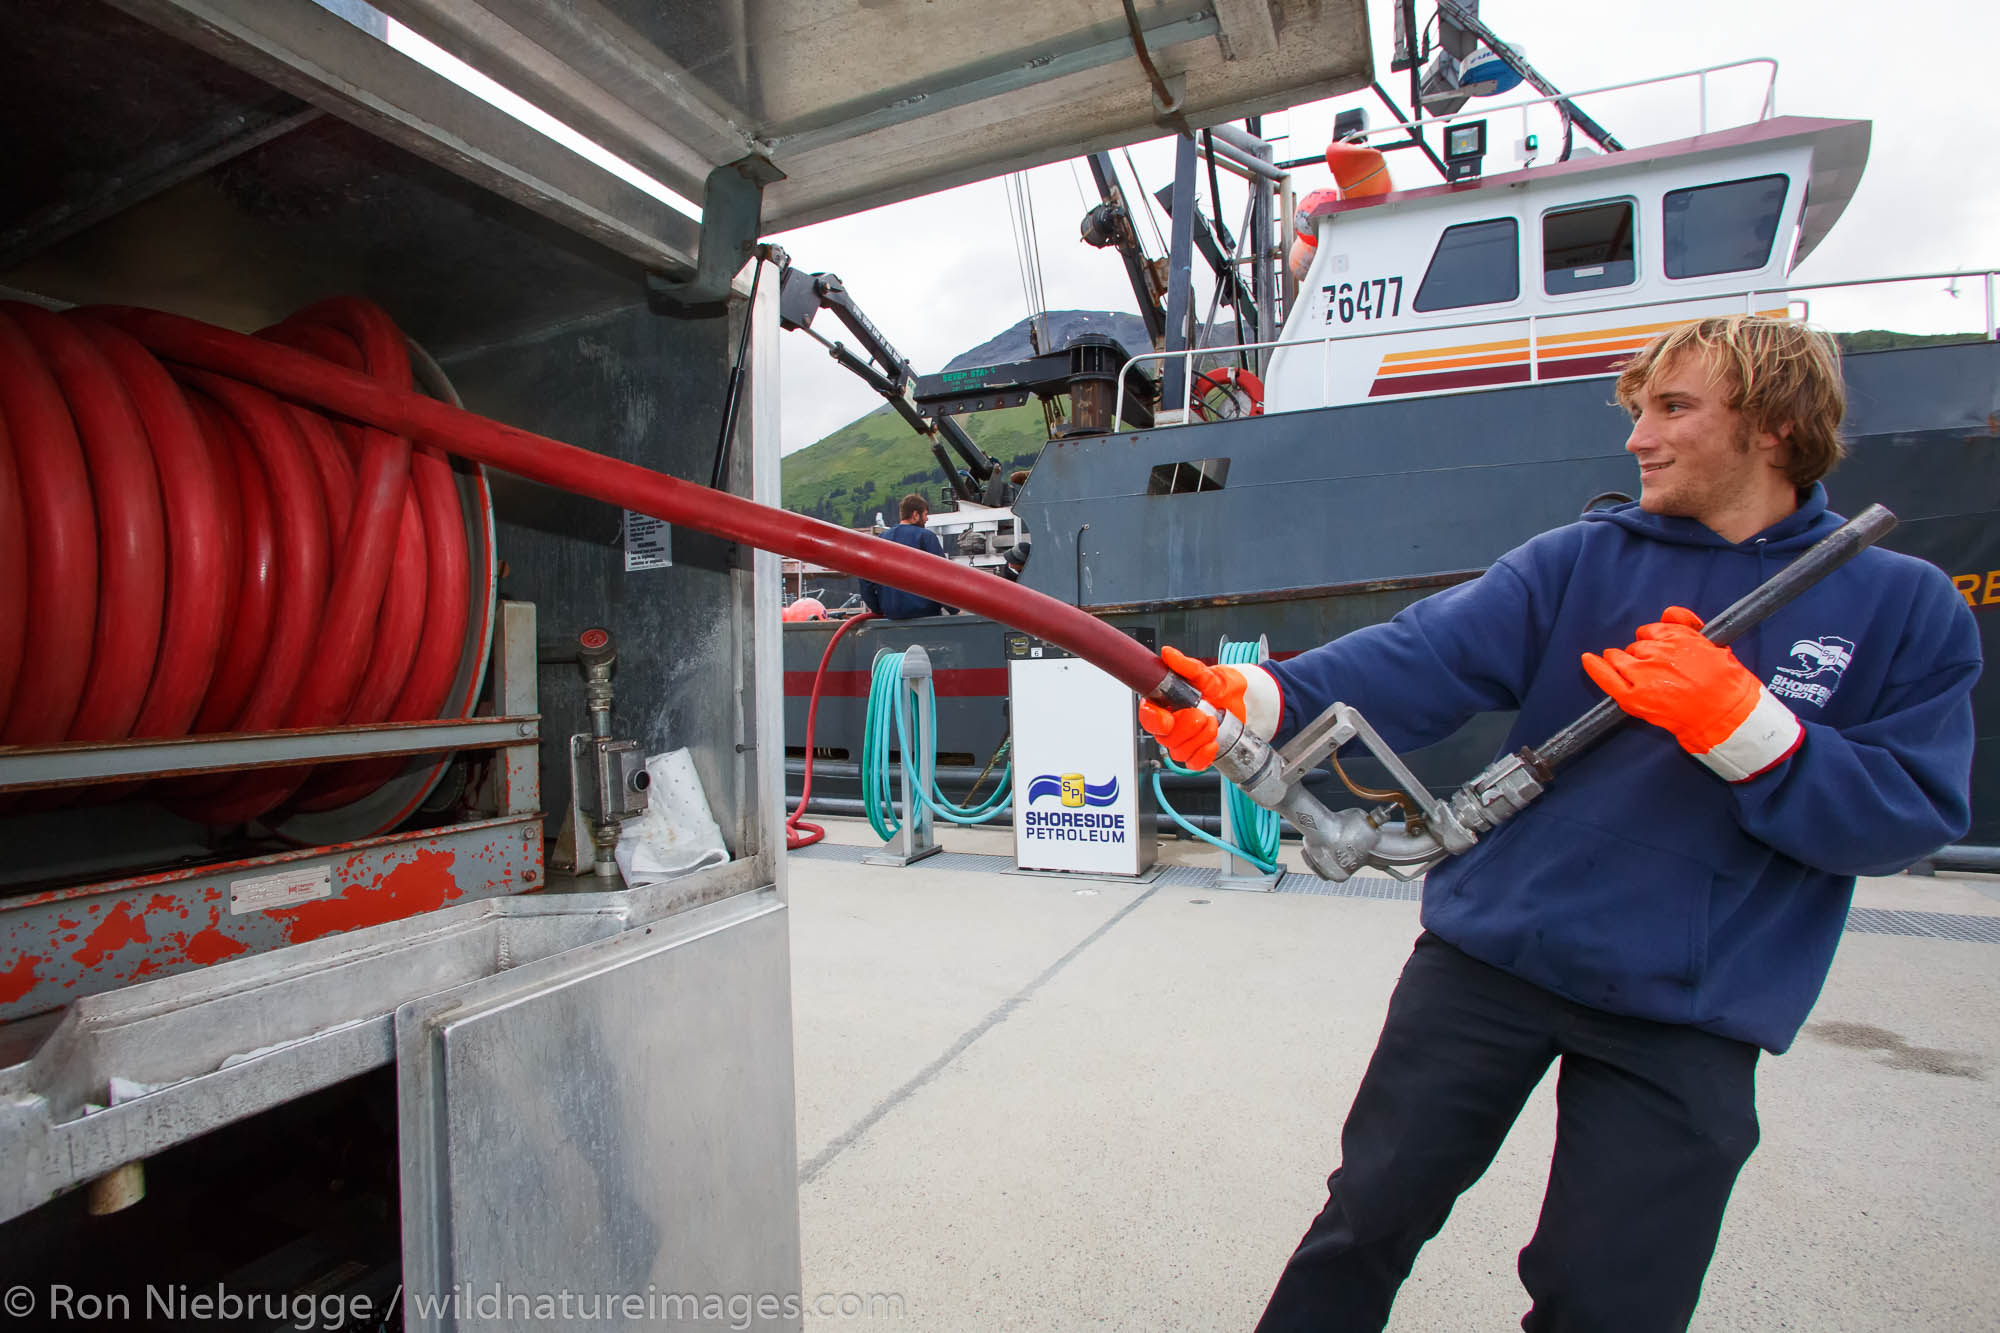 Shoreside Petroleum shoot June 2014.